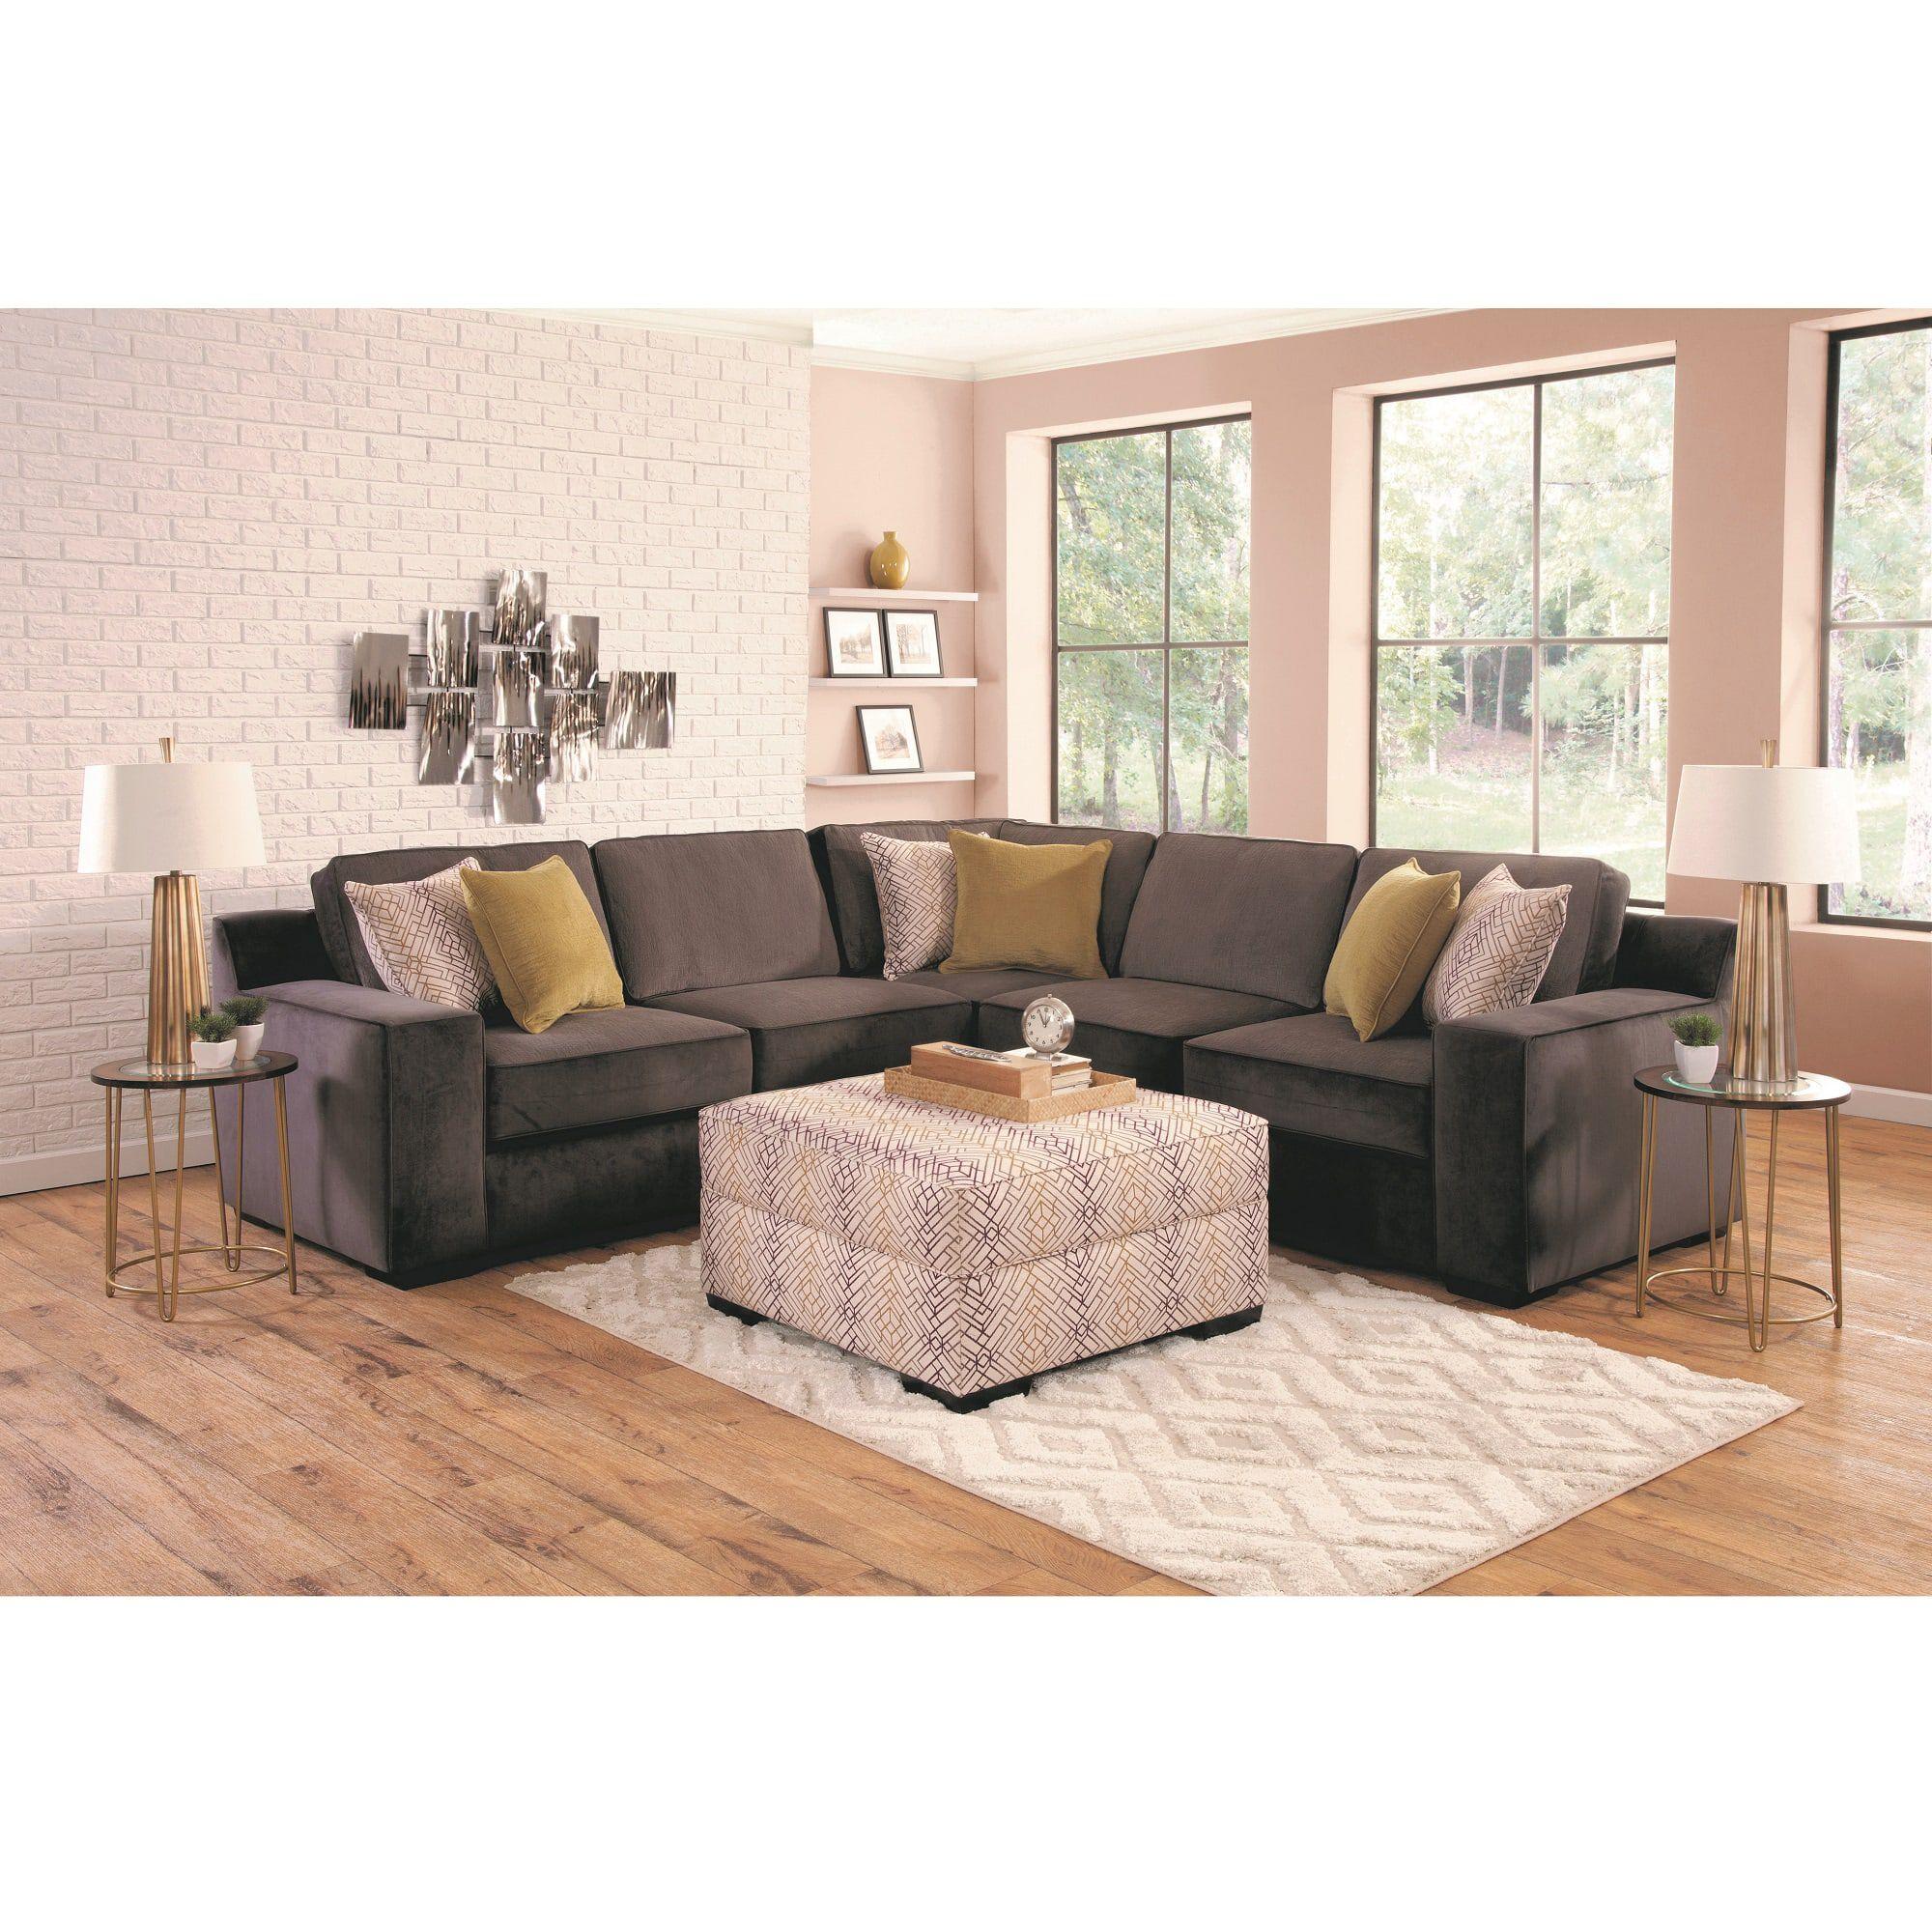 Woodhaven Industries Sectionals 4 Piece Sonja Living Room